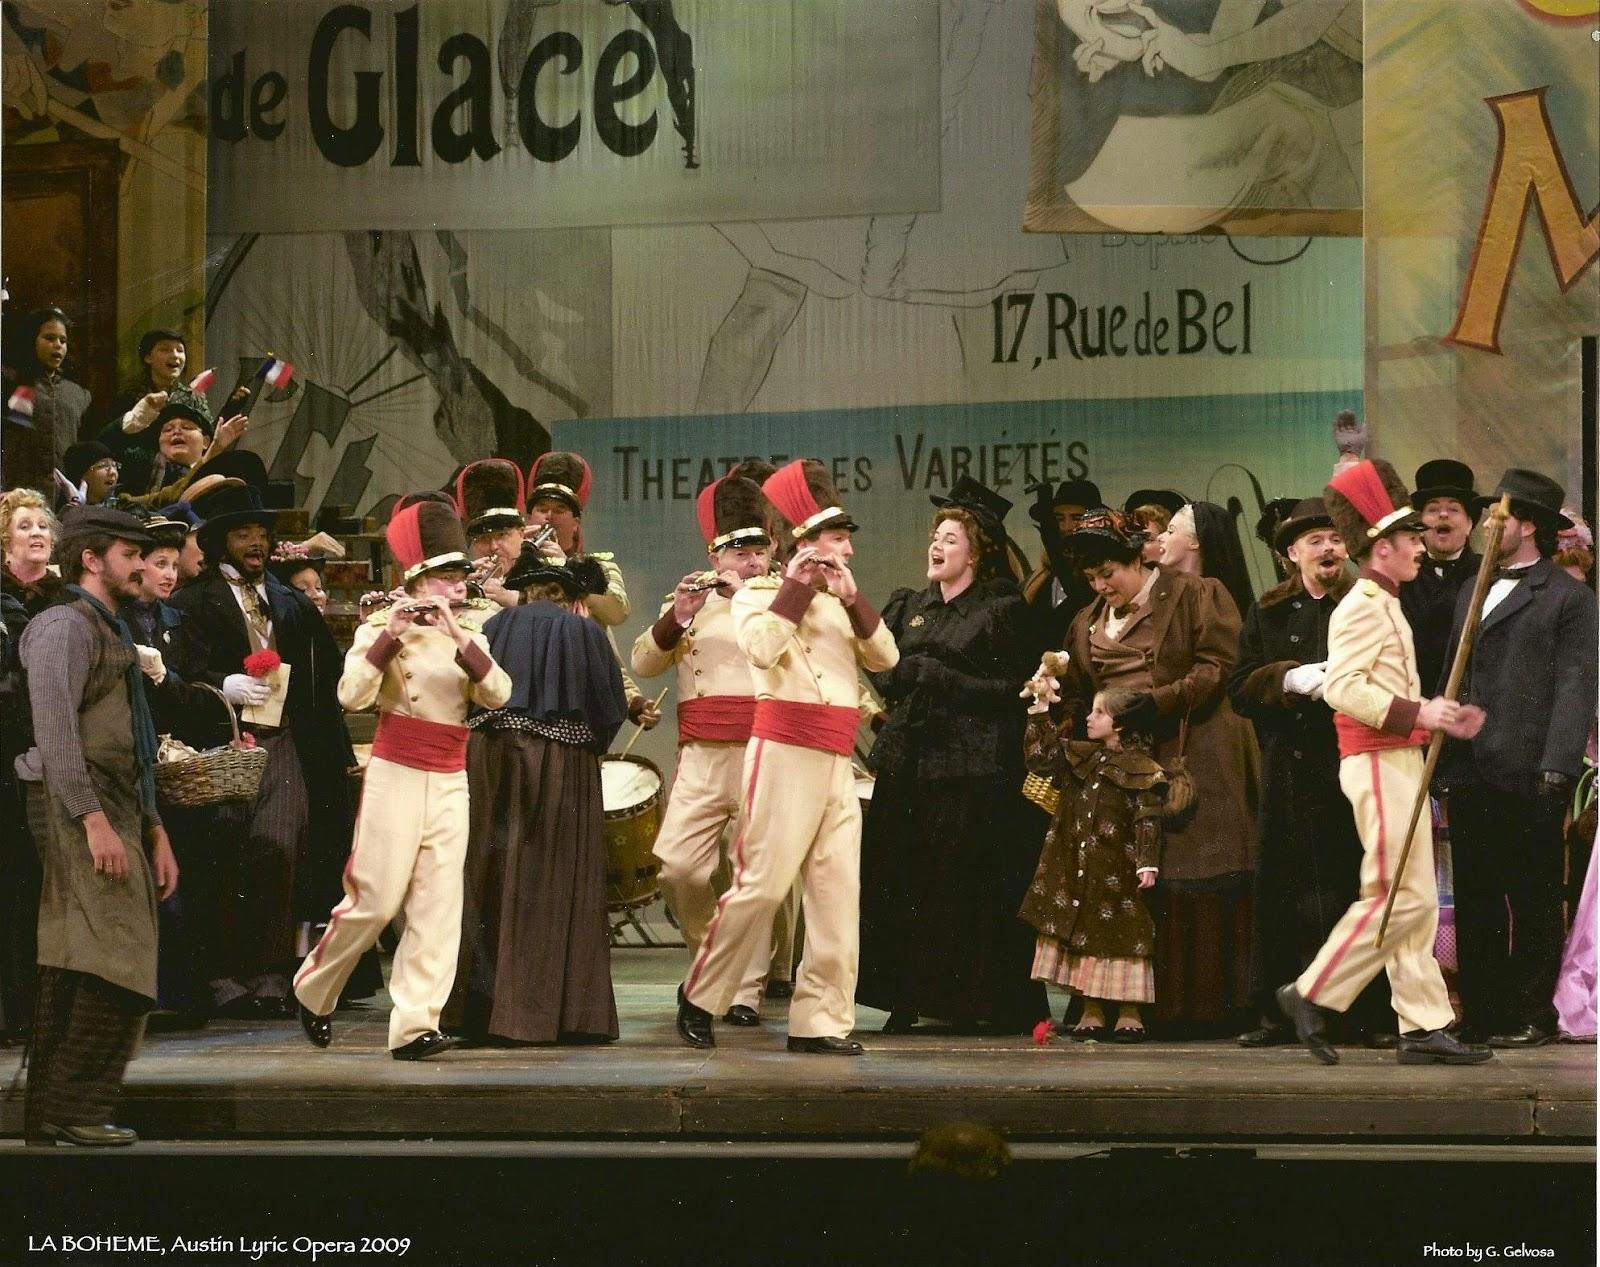 Scene from Act II of Austin Lyric Opera's 2009 Production of La Boheme